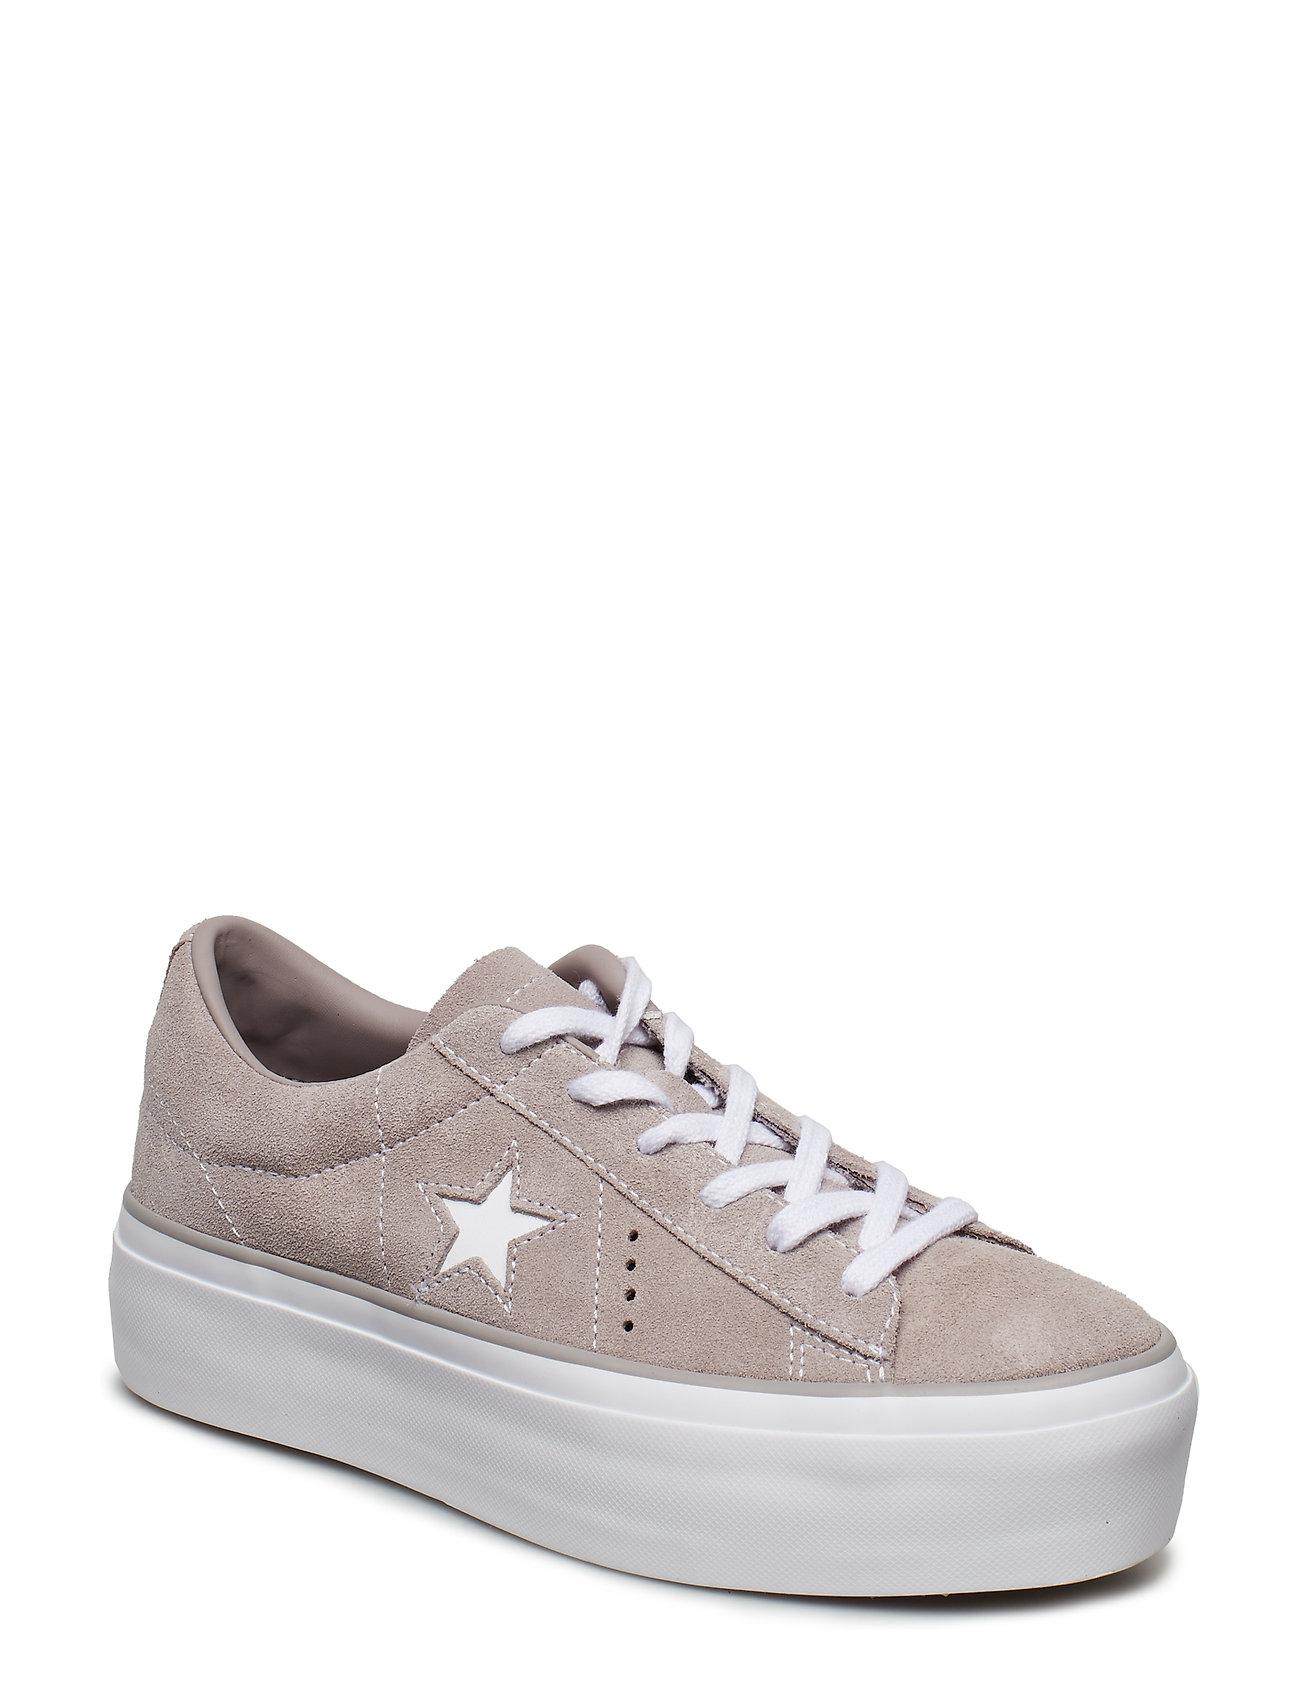 58ac6fdb6e2 MERCURY GREY/MERCURY GREY Converse One Star Platform Ox sneakers for ...